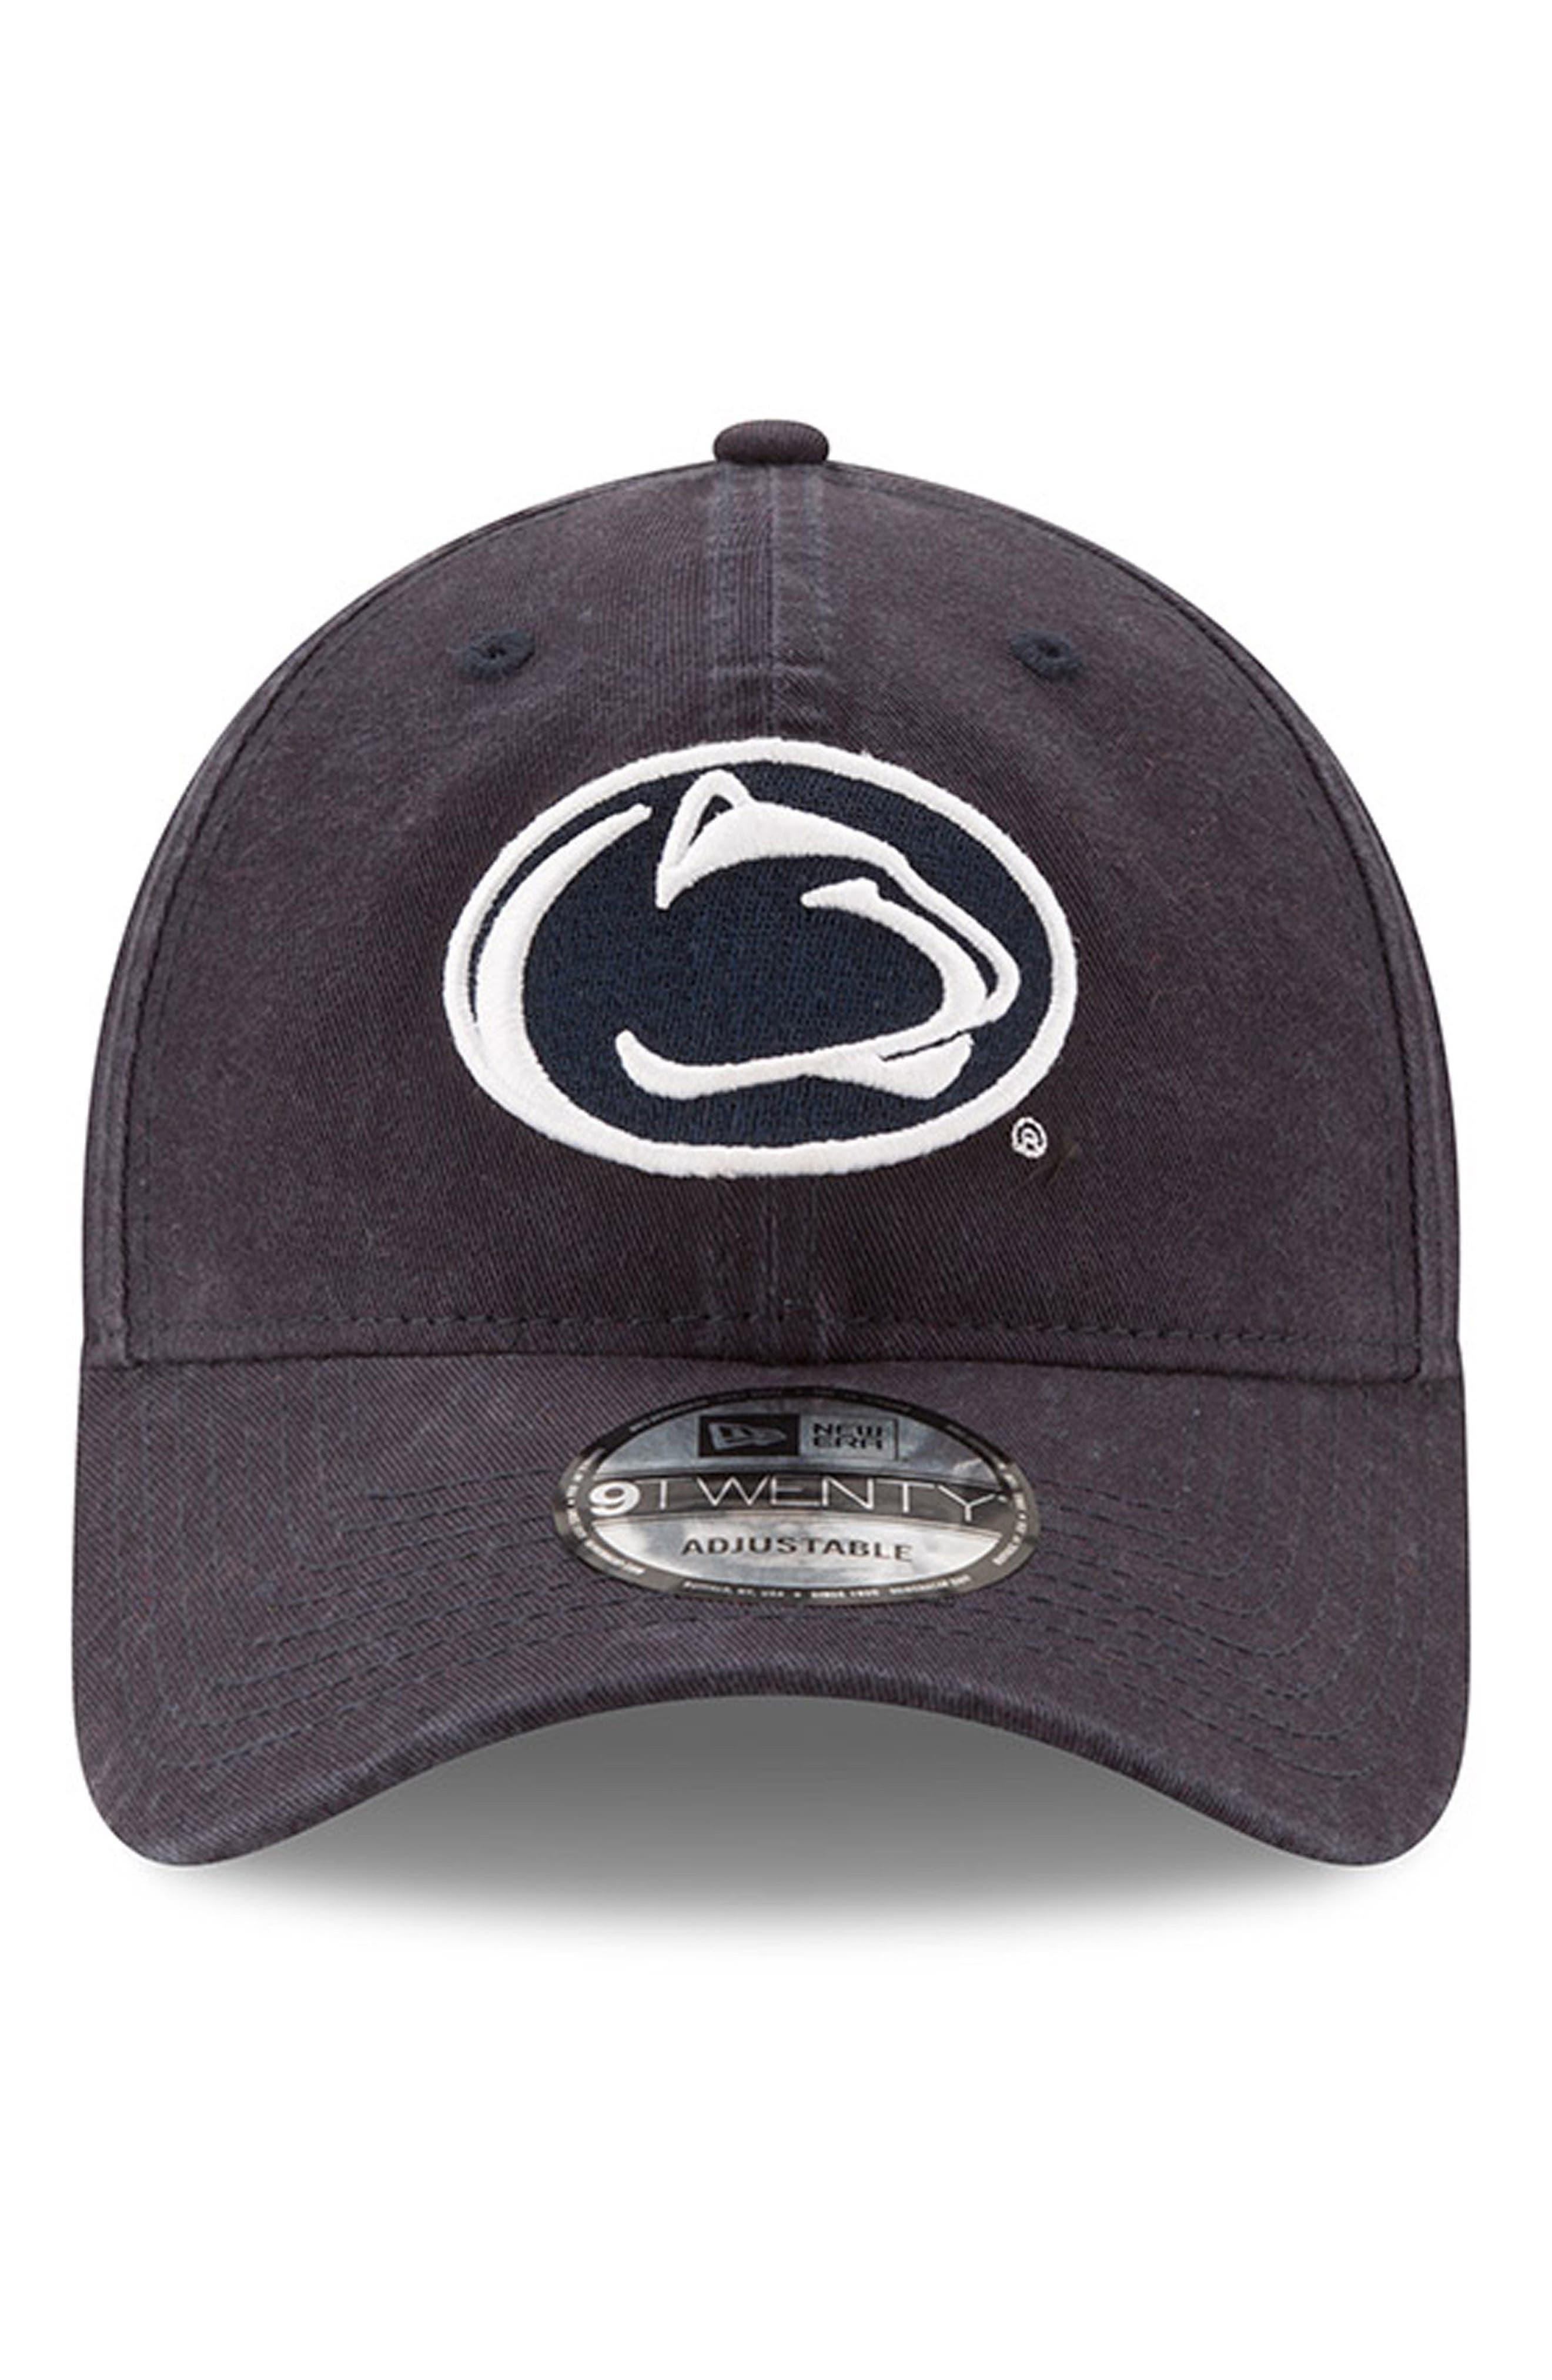 New Era Collegiate Core Classic - Penn State Nittany Lions Baseball Cap,                             Alternate thumbnail 2, color,